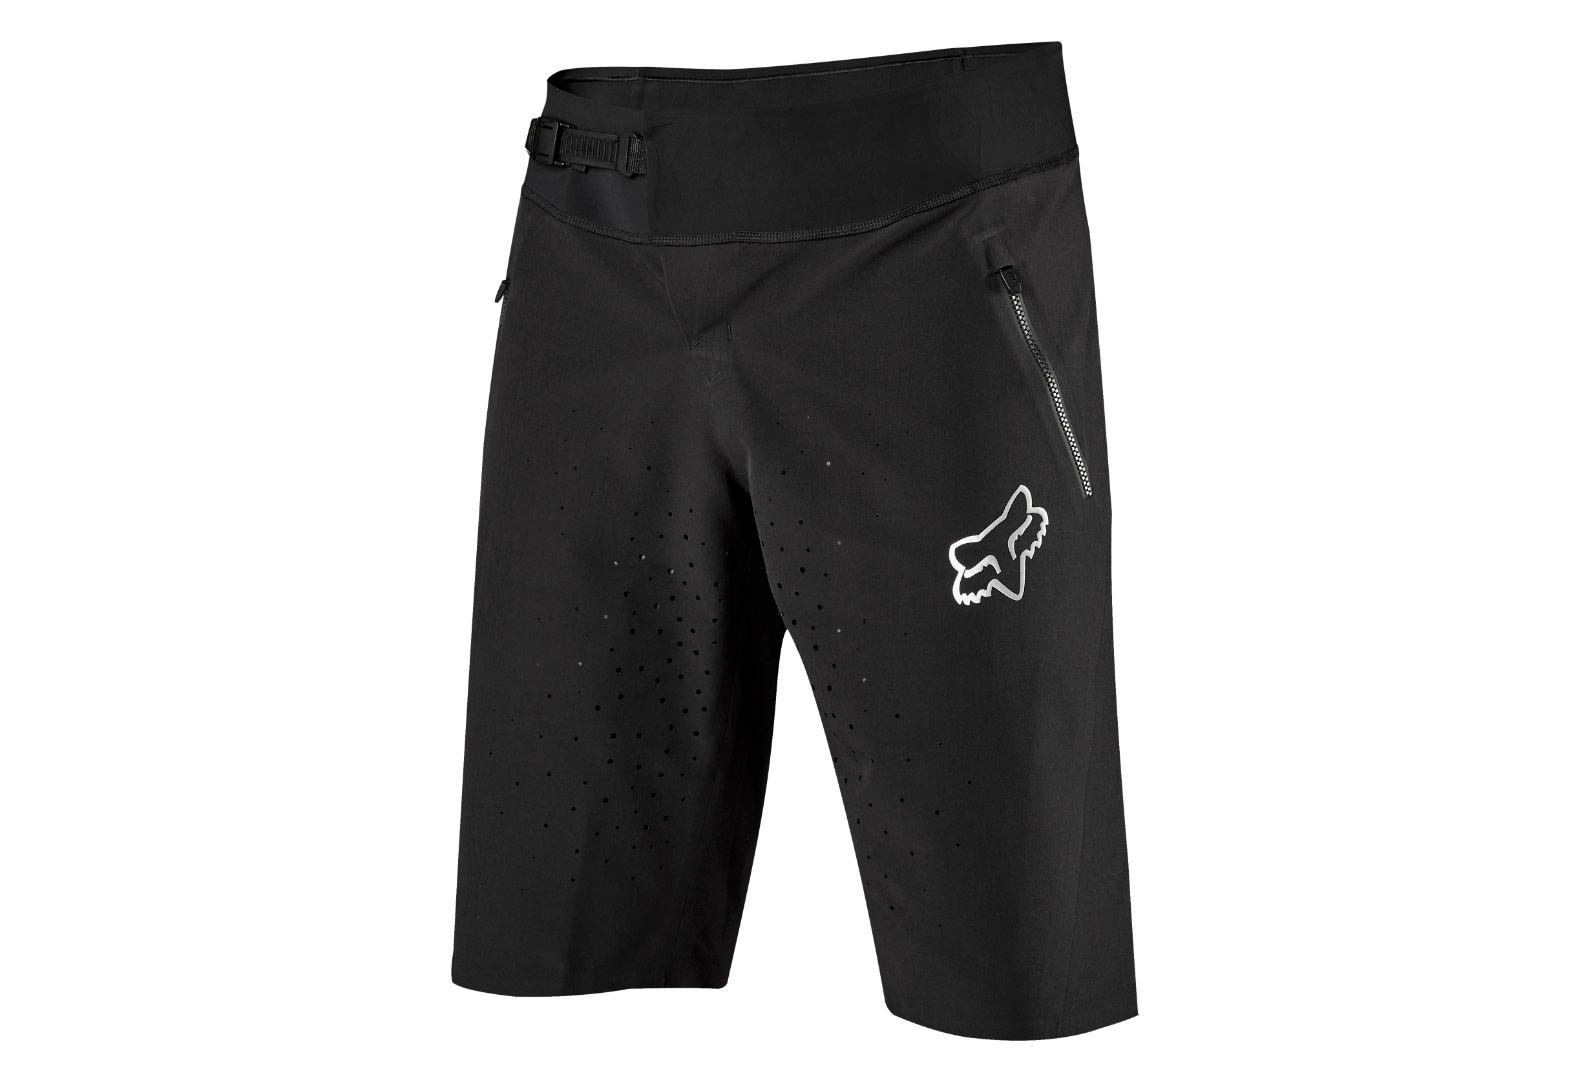 6067fee392 Pantalones cortos Fox Attack Pro negro cromo